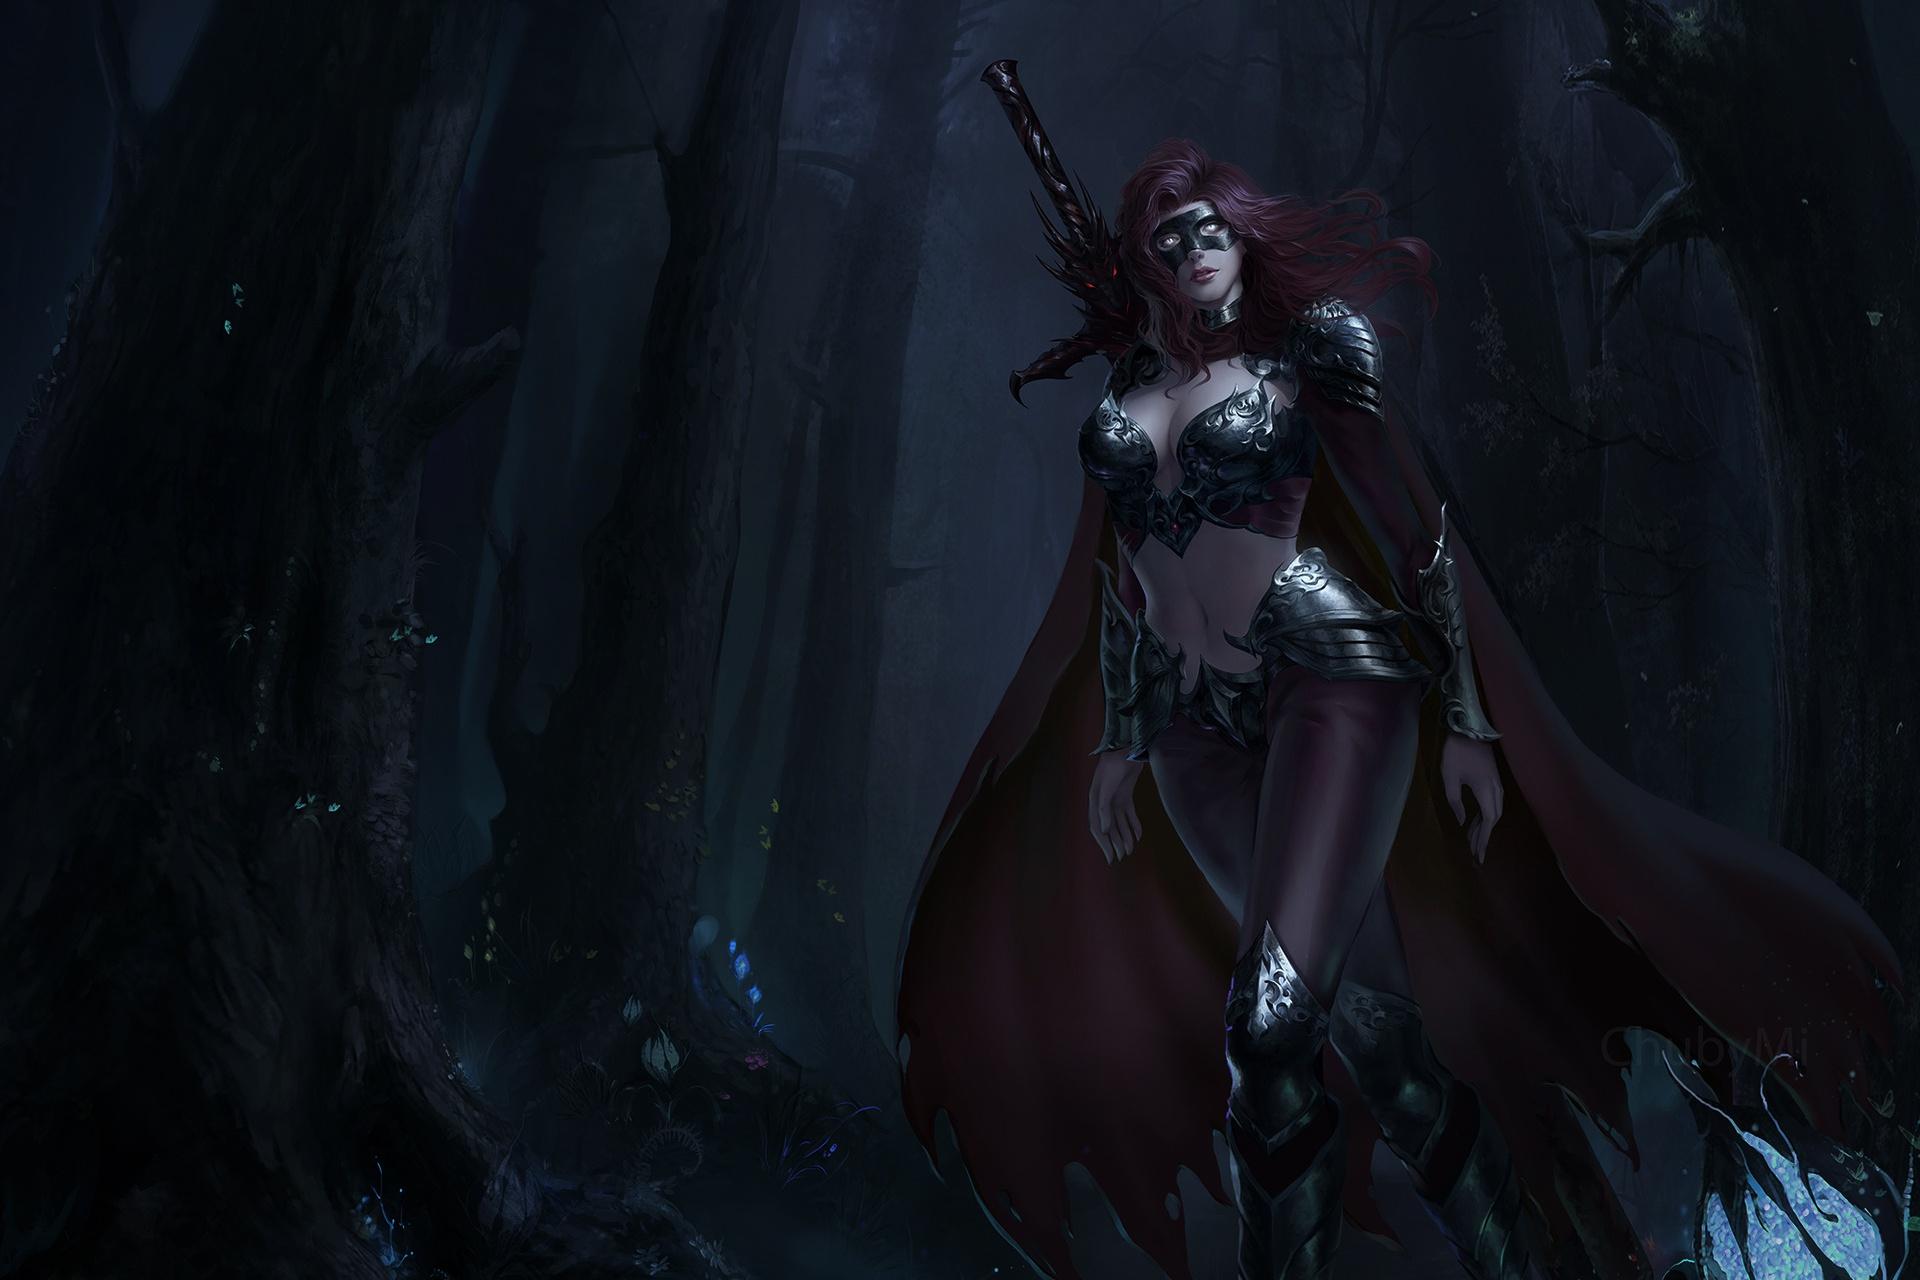 Wallpaper : fantasy art, dark fantasy, warrior, creature